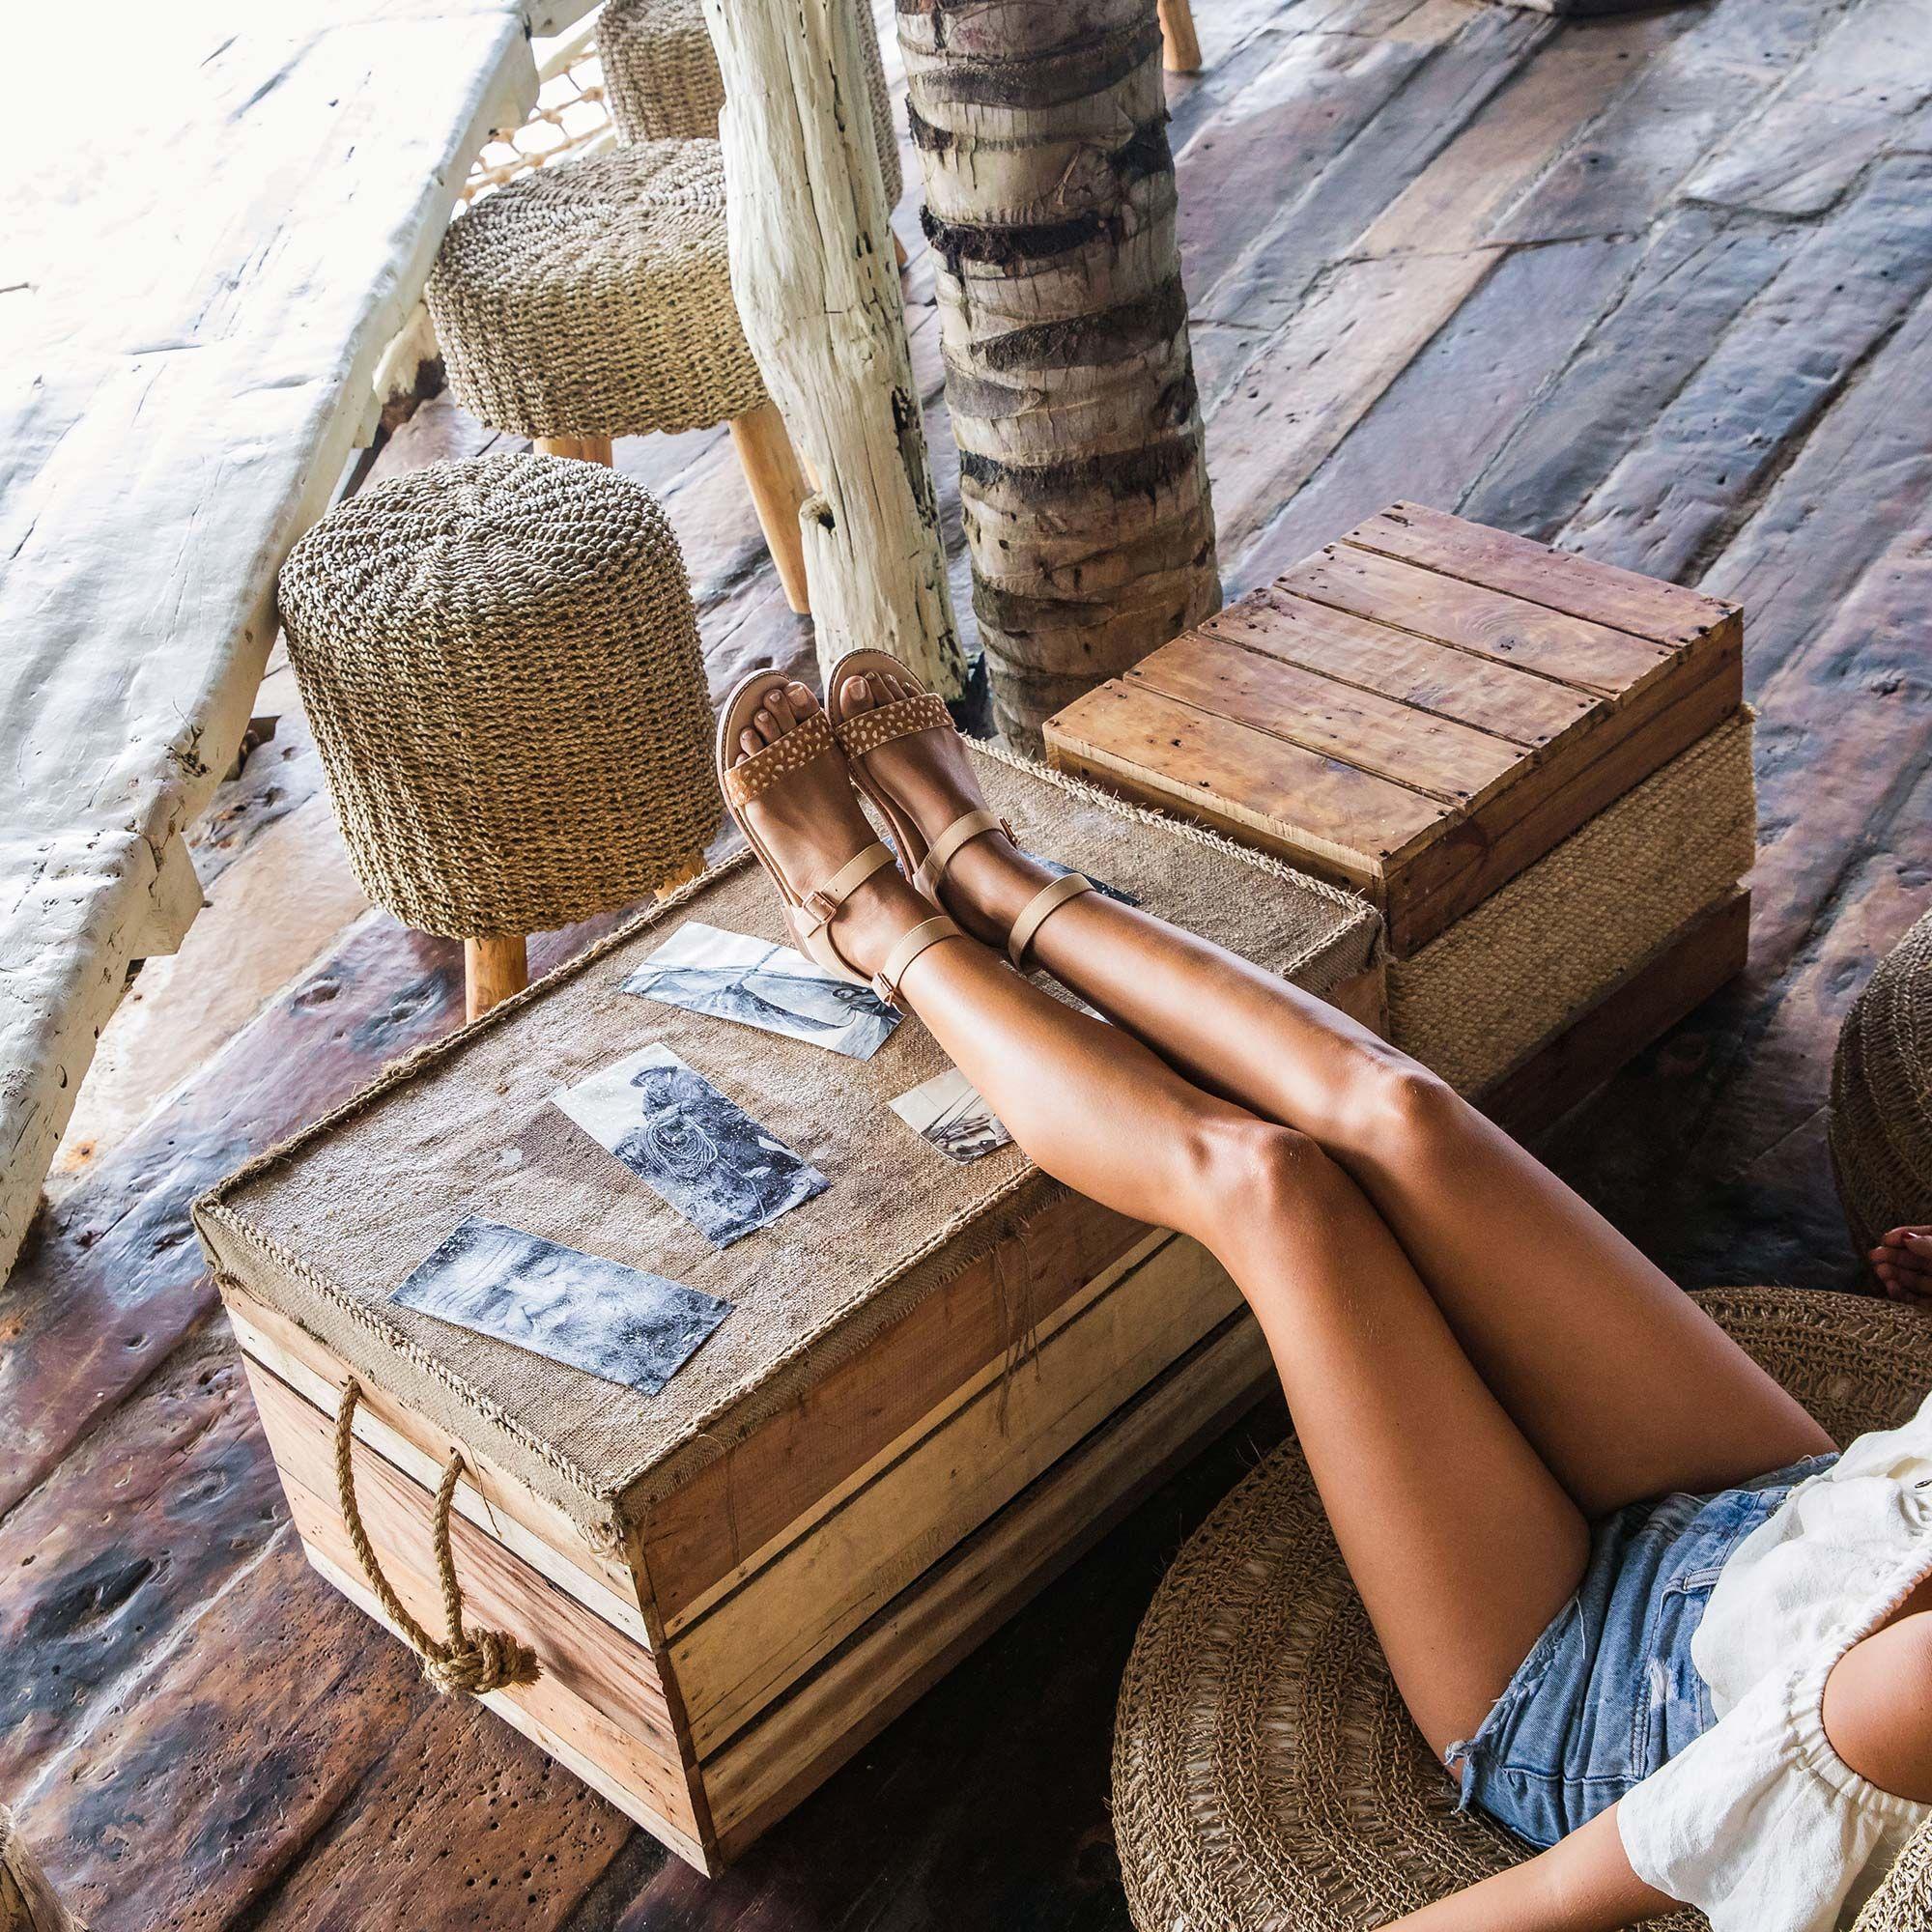 Bared_Footwear_La_Brisa_Bali_Travel_Summer_Womens_Campaign_Aracari_Deer_Print_Sandals_Up_Close